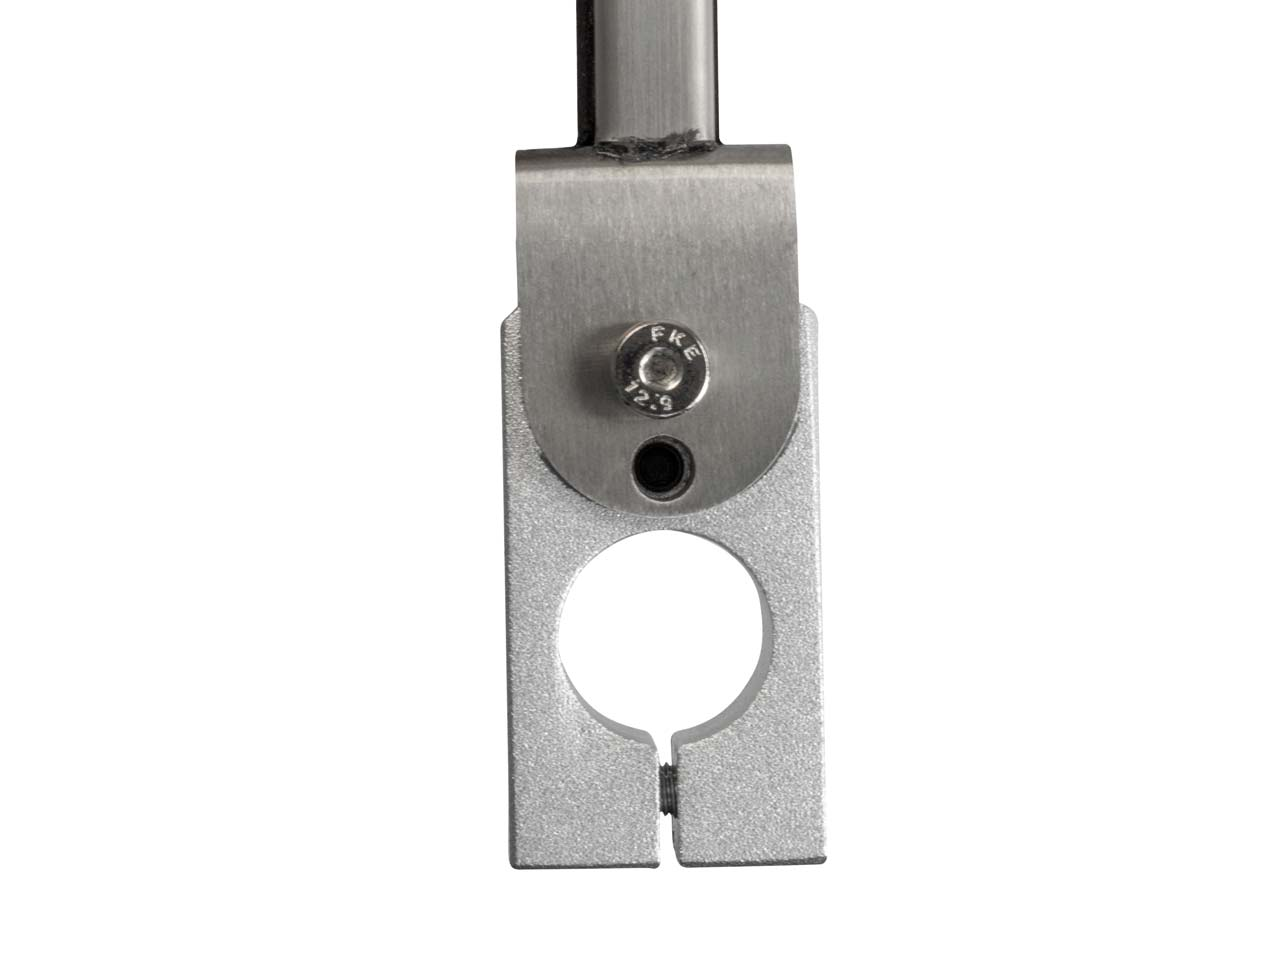 Genuine-US-Foredom-Workbench-Accessories-System miniatura 34